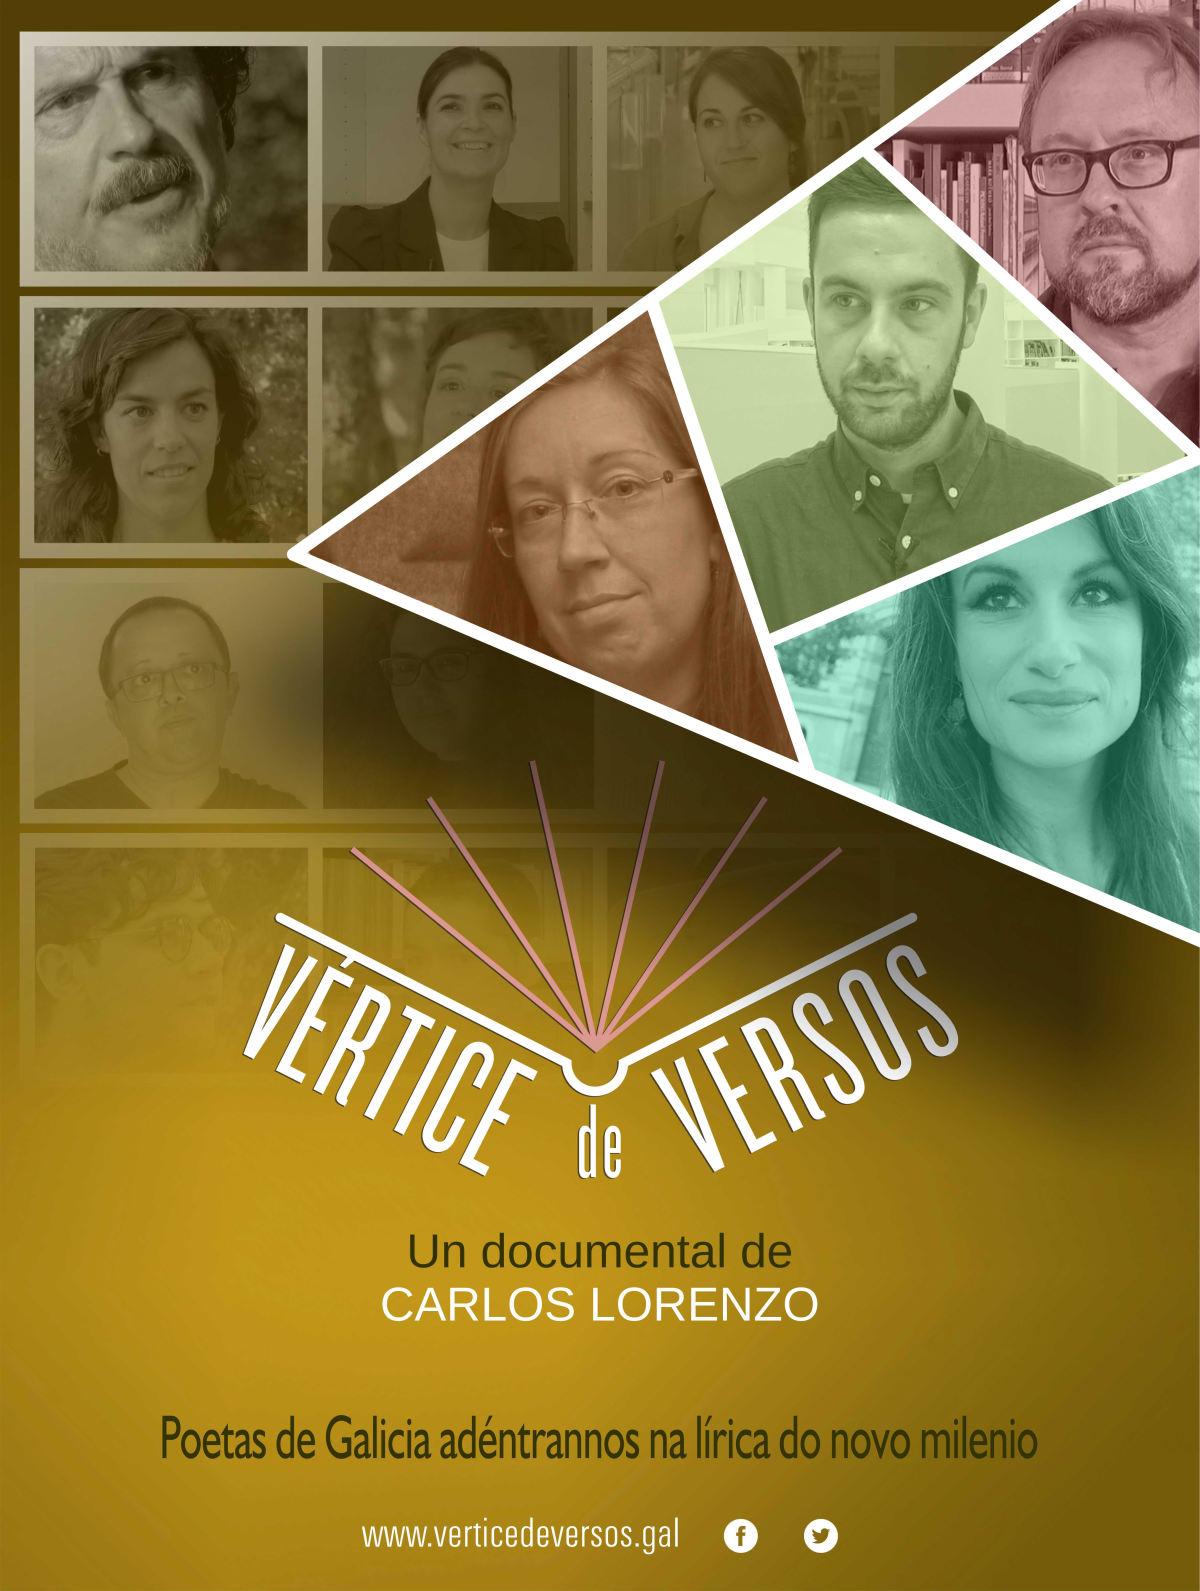 O documental <i>Vértice de Versos</i> percorre a poesía contemporánea galega